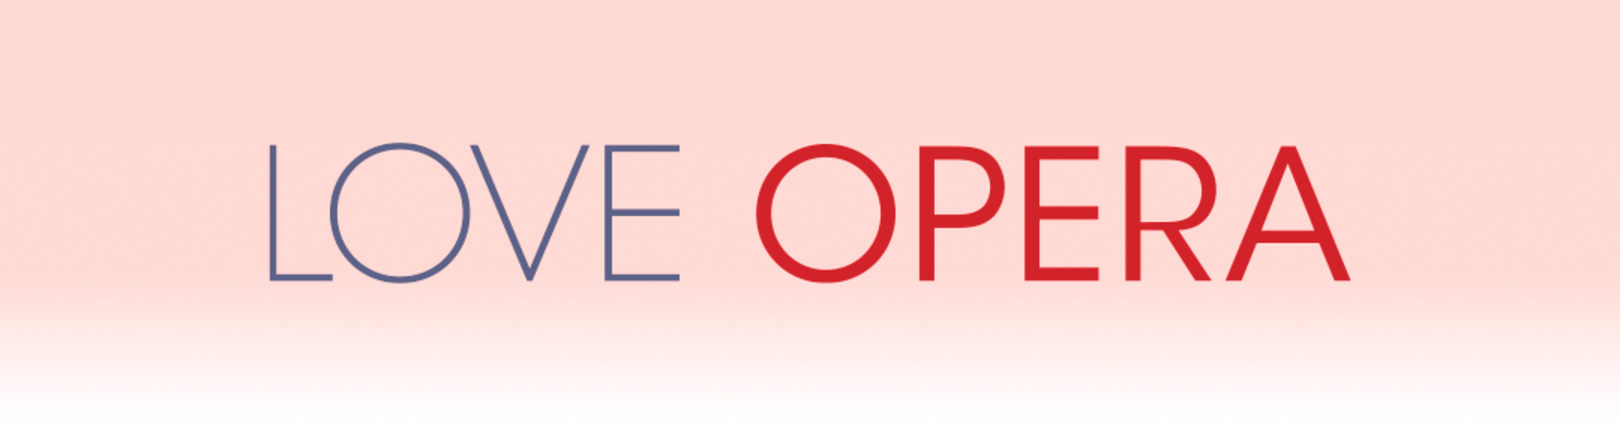 Love Opera